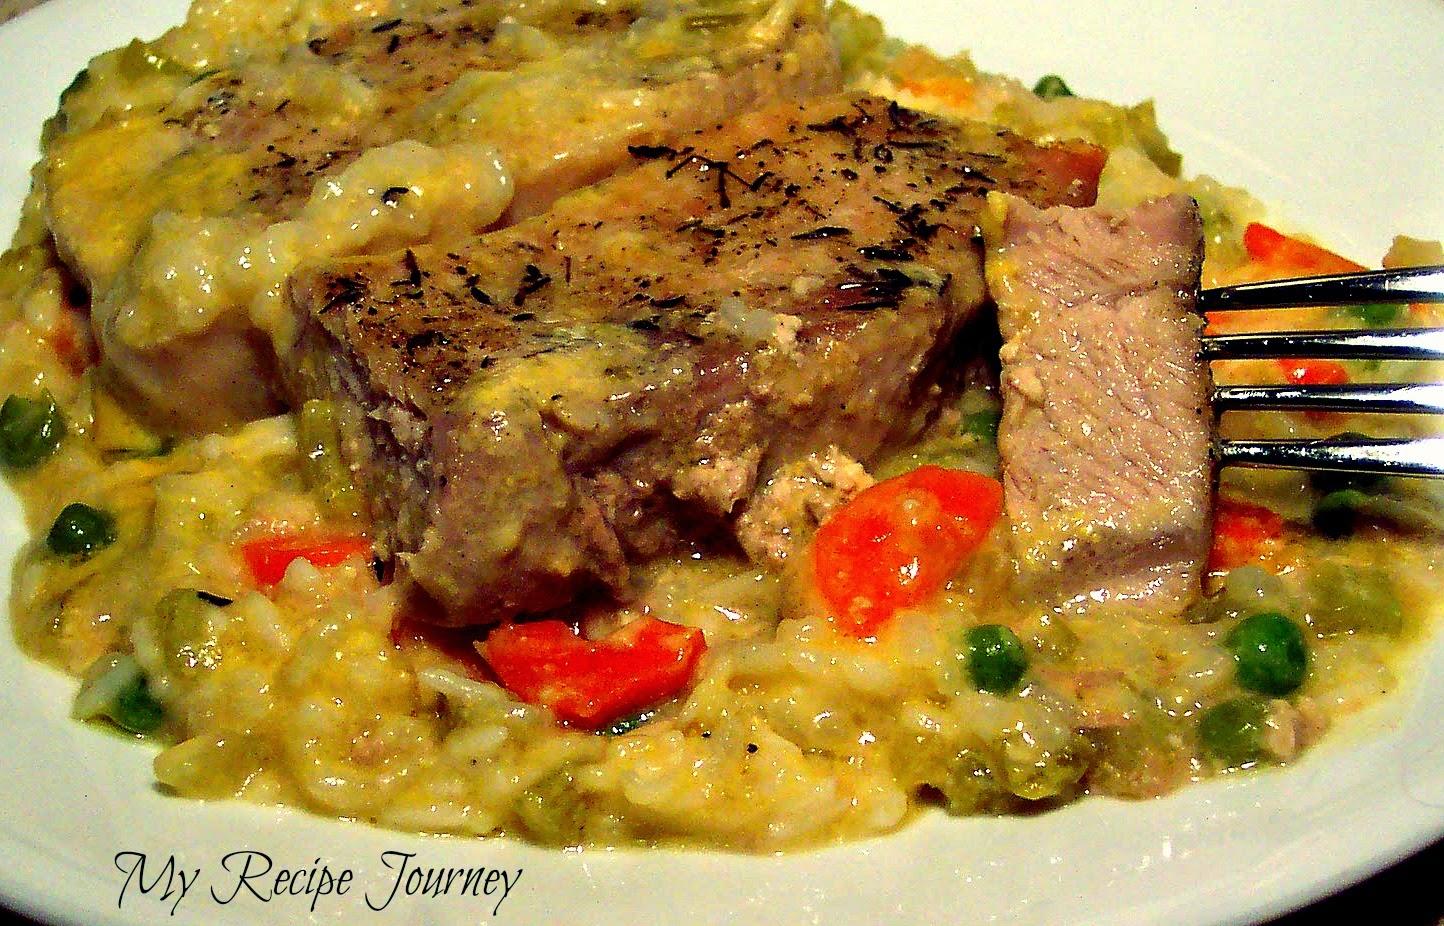 One Pan Baked Pork Chops on Veggie Rice